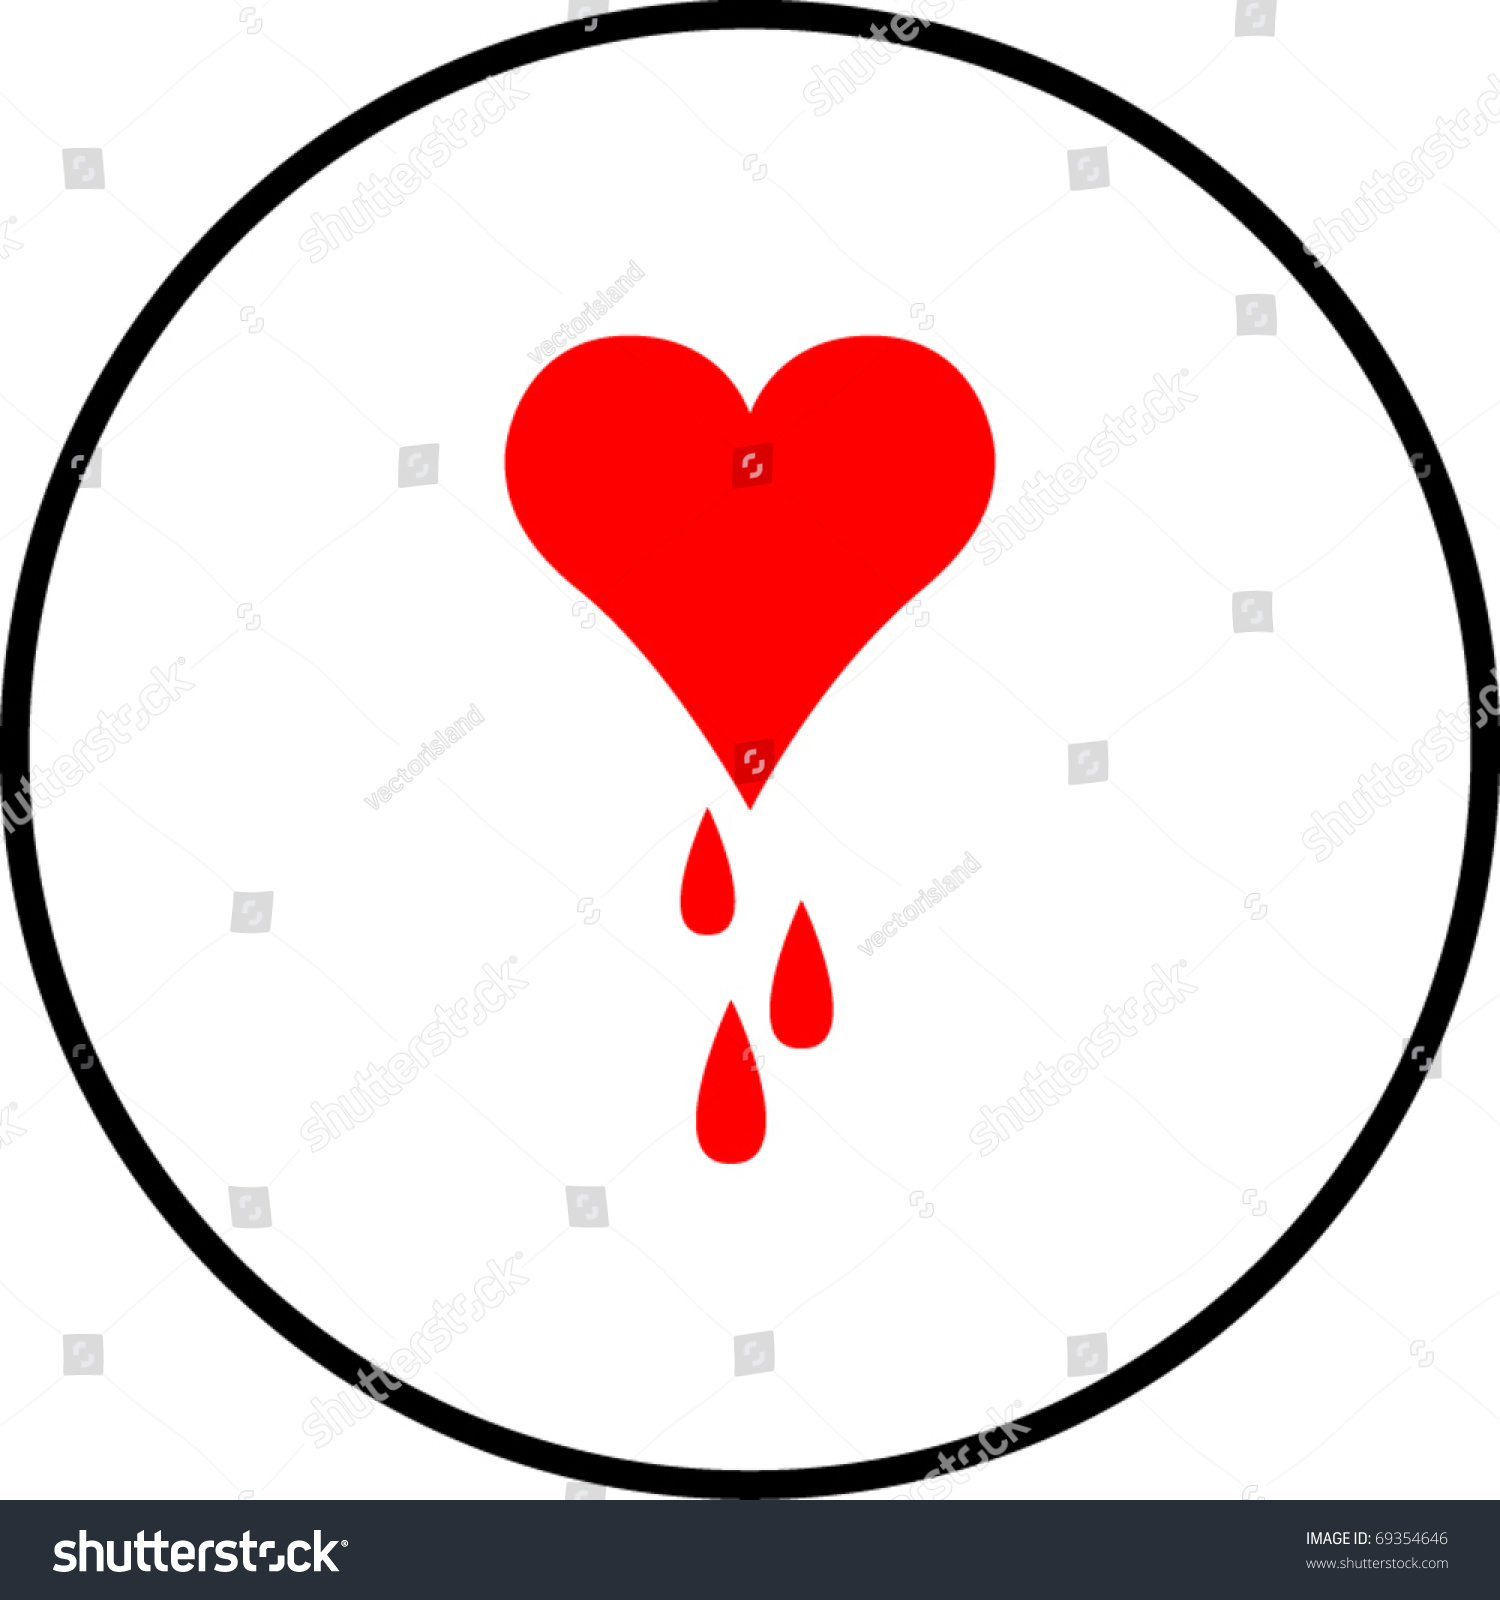 Heart bleeding symbol stock vector 69354646 shutterstock heart bleeding symbol buycottarizona